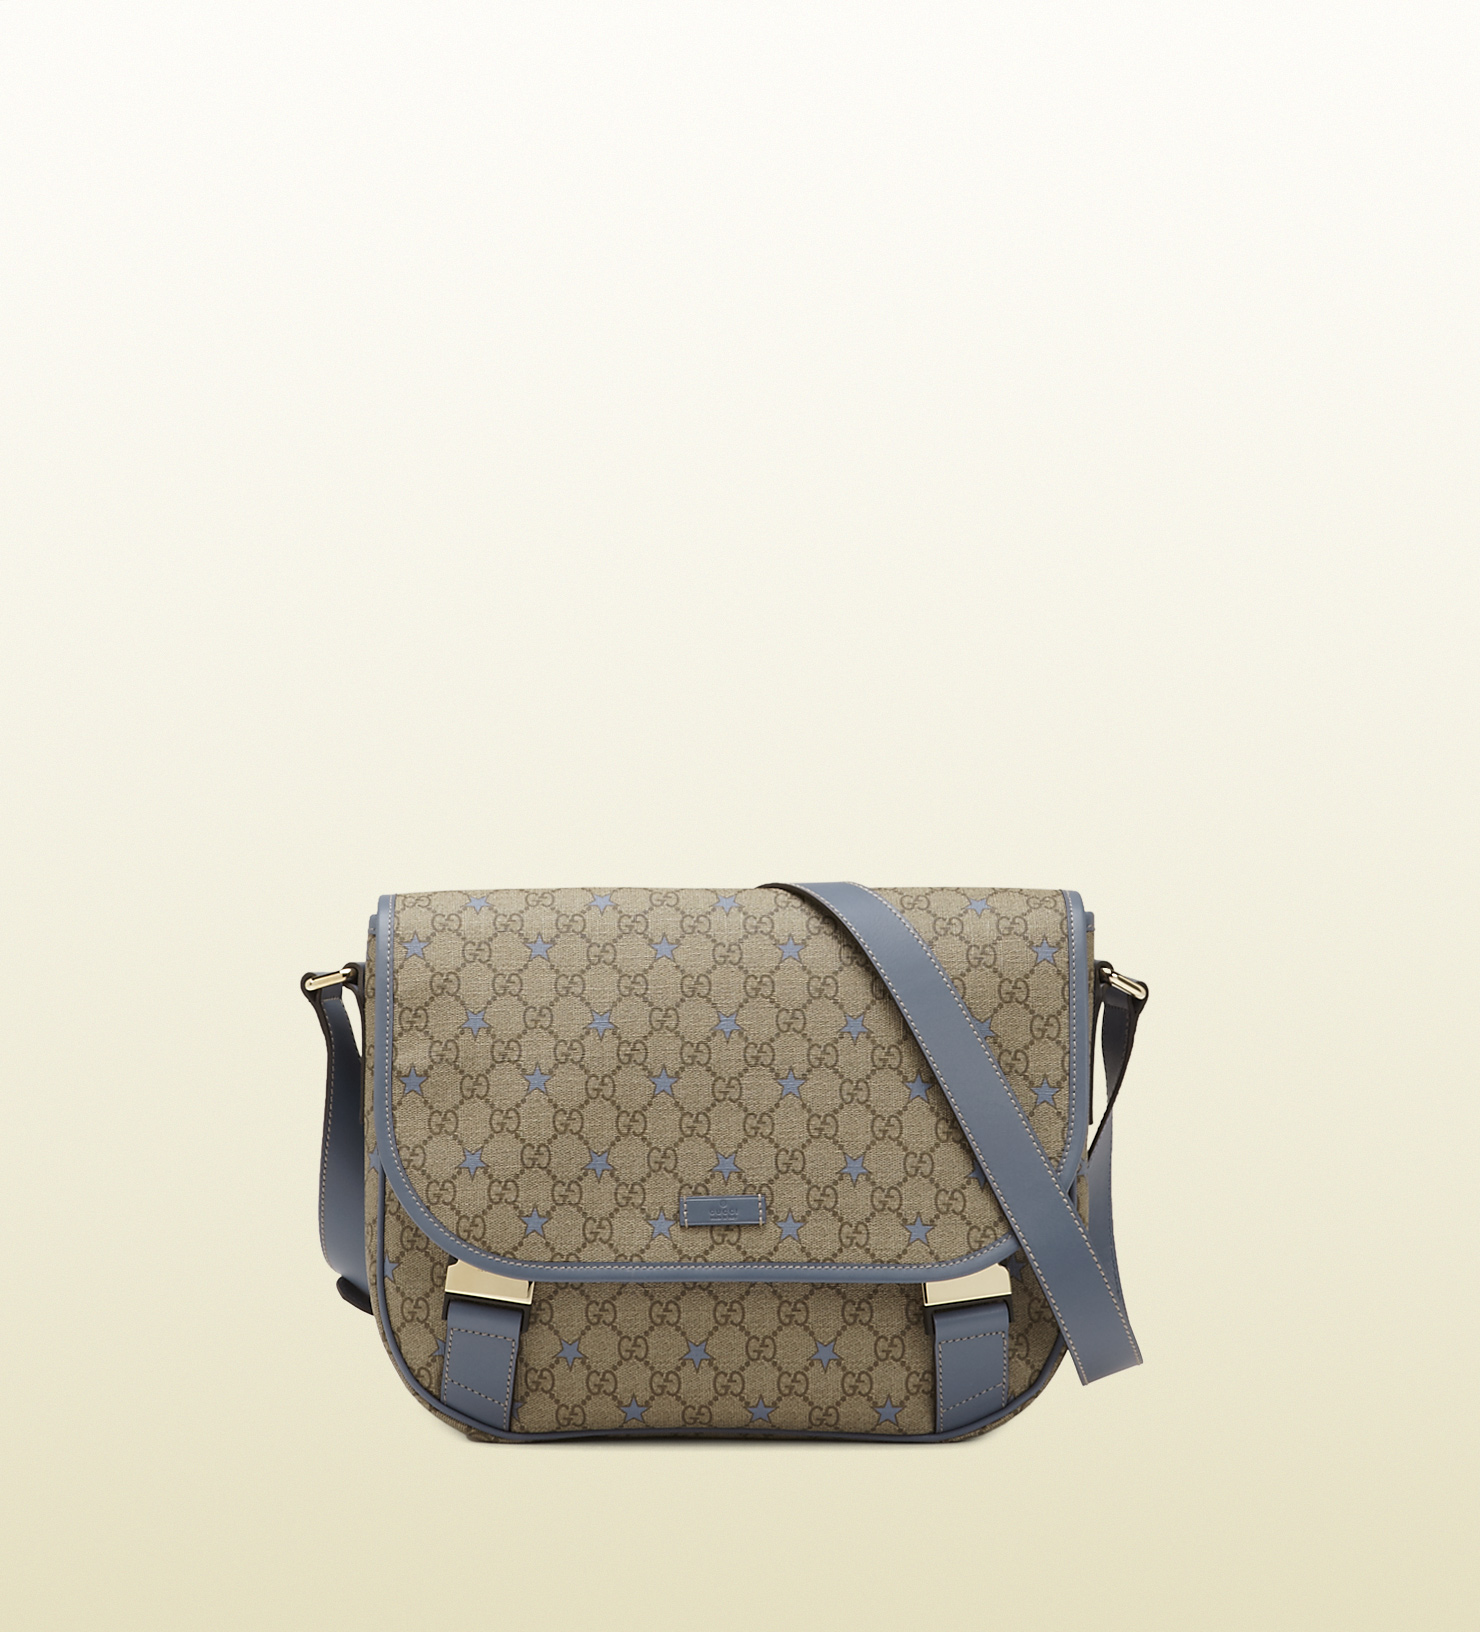 6d99d5a954b Gucci Medium Gg Supreme Stars Canvas Messenger Bag in Natural for ...